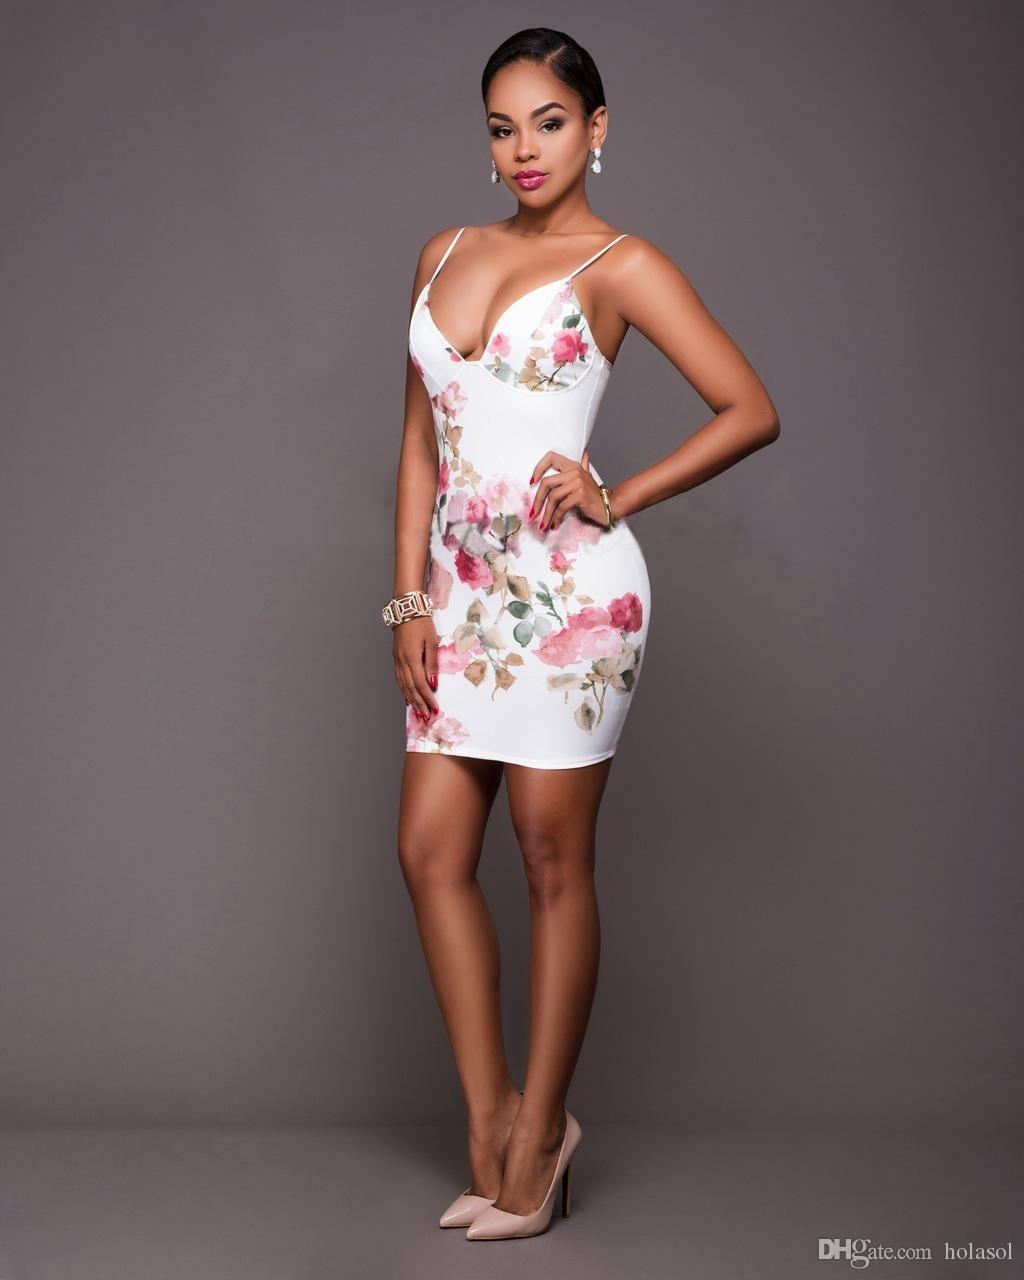 17 Elegant Frau Im Kleid GalerieFormal Elegant Frau Im Kleid Boutique